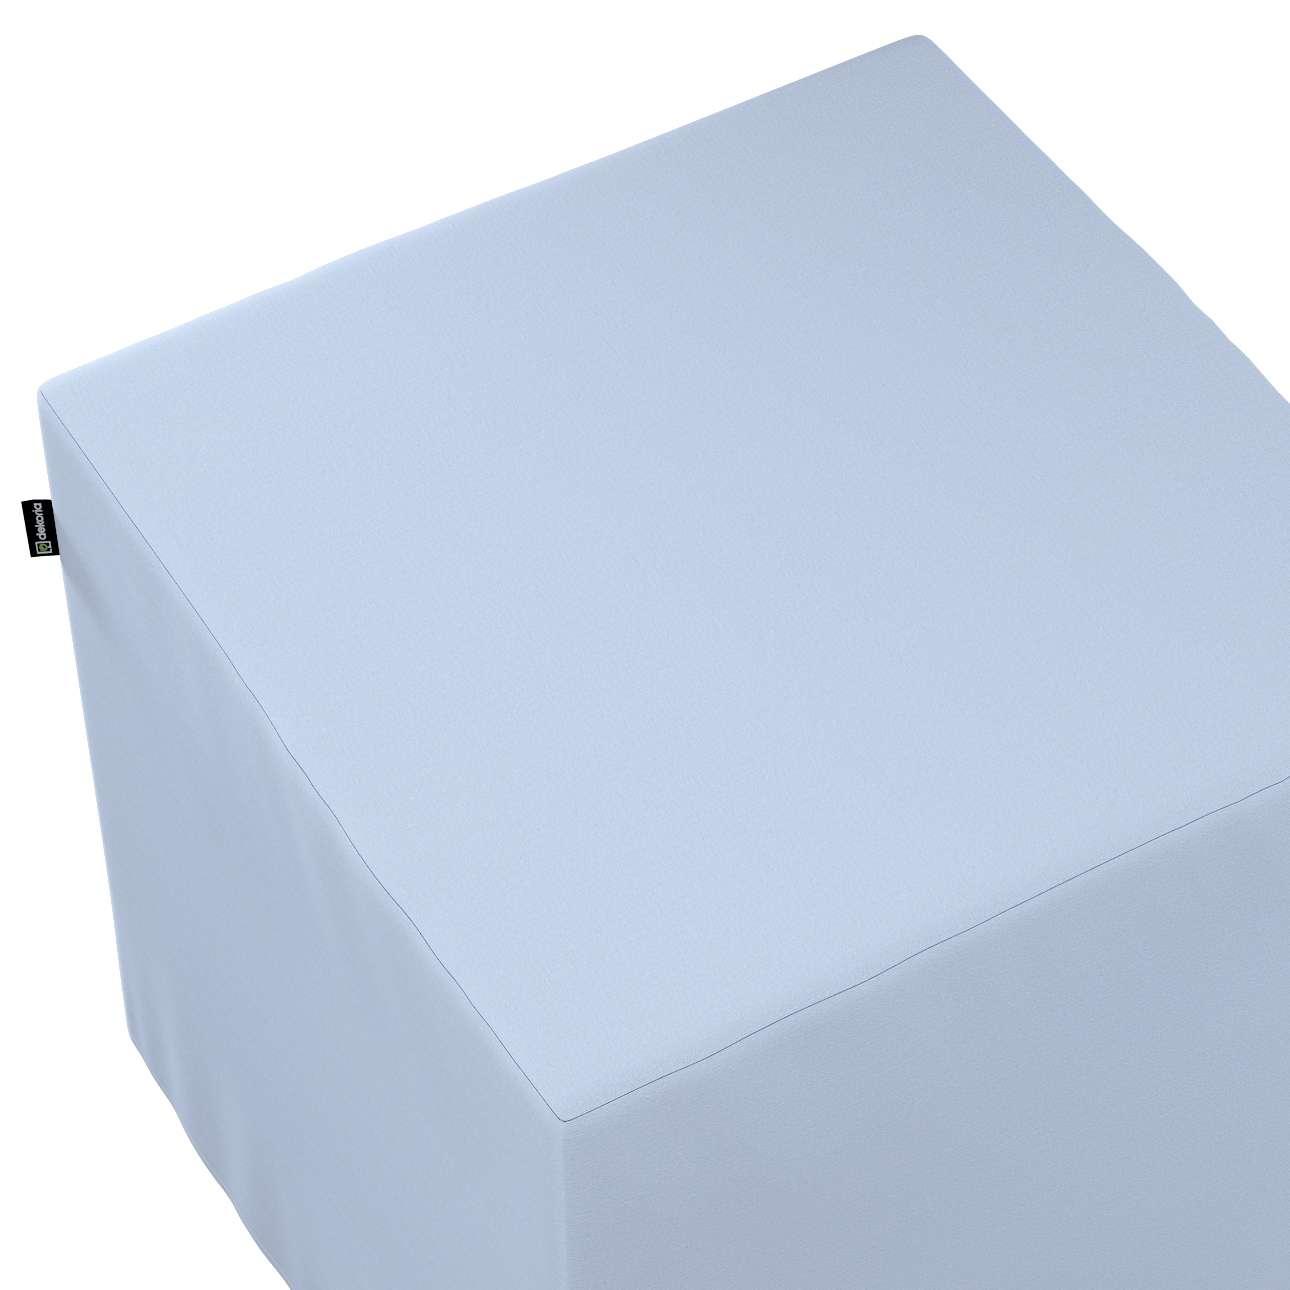 Pufa kostka w kolekcji Loneta, tkanina: 133-35